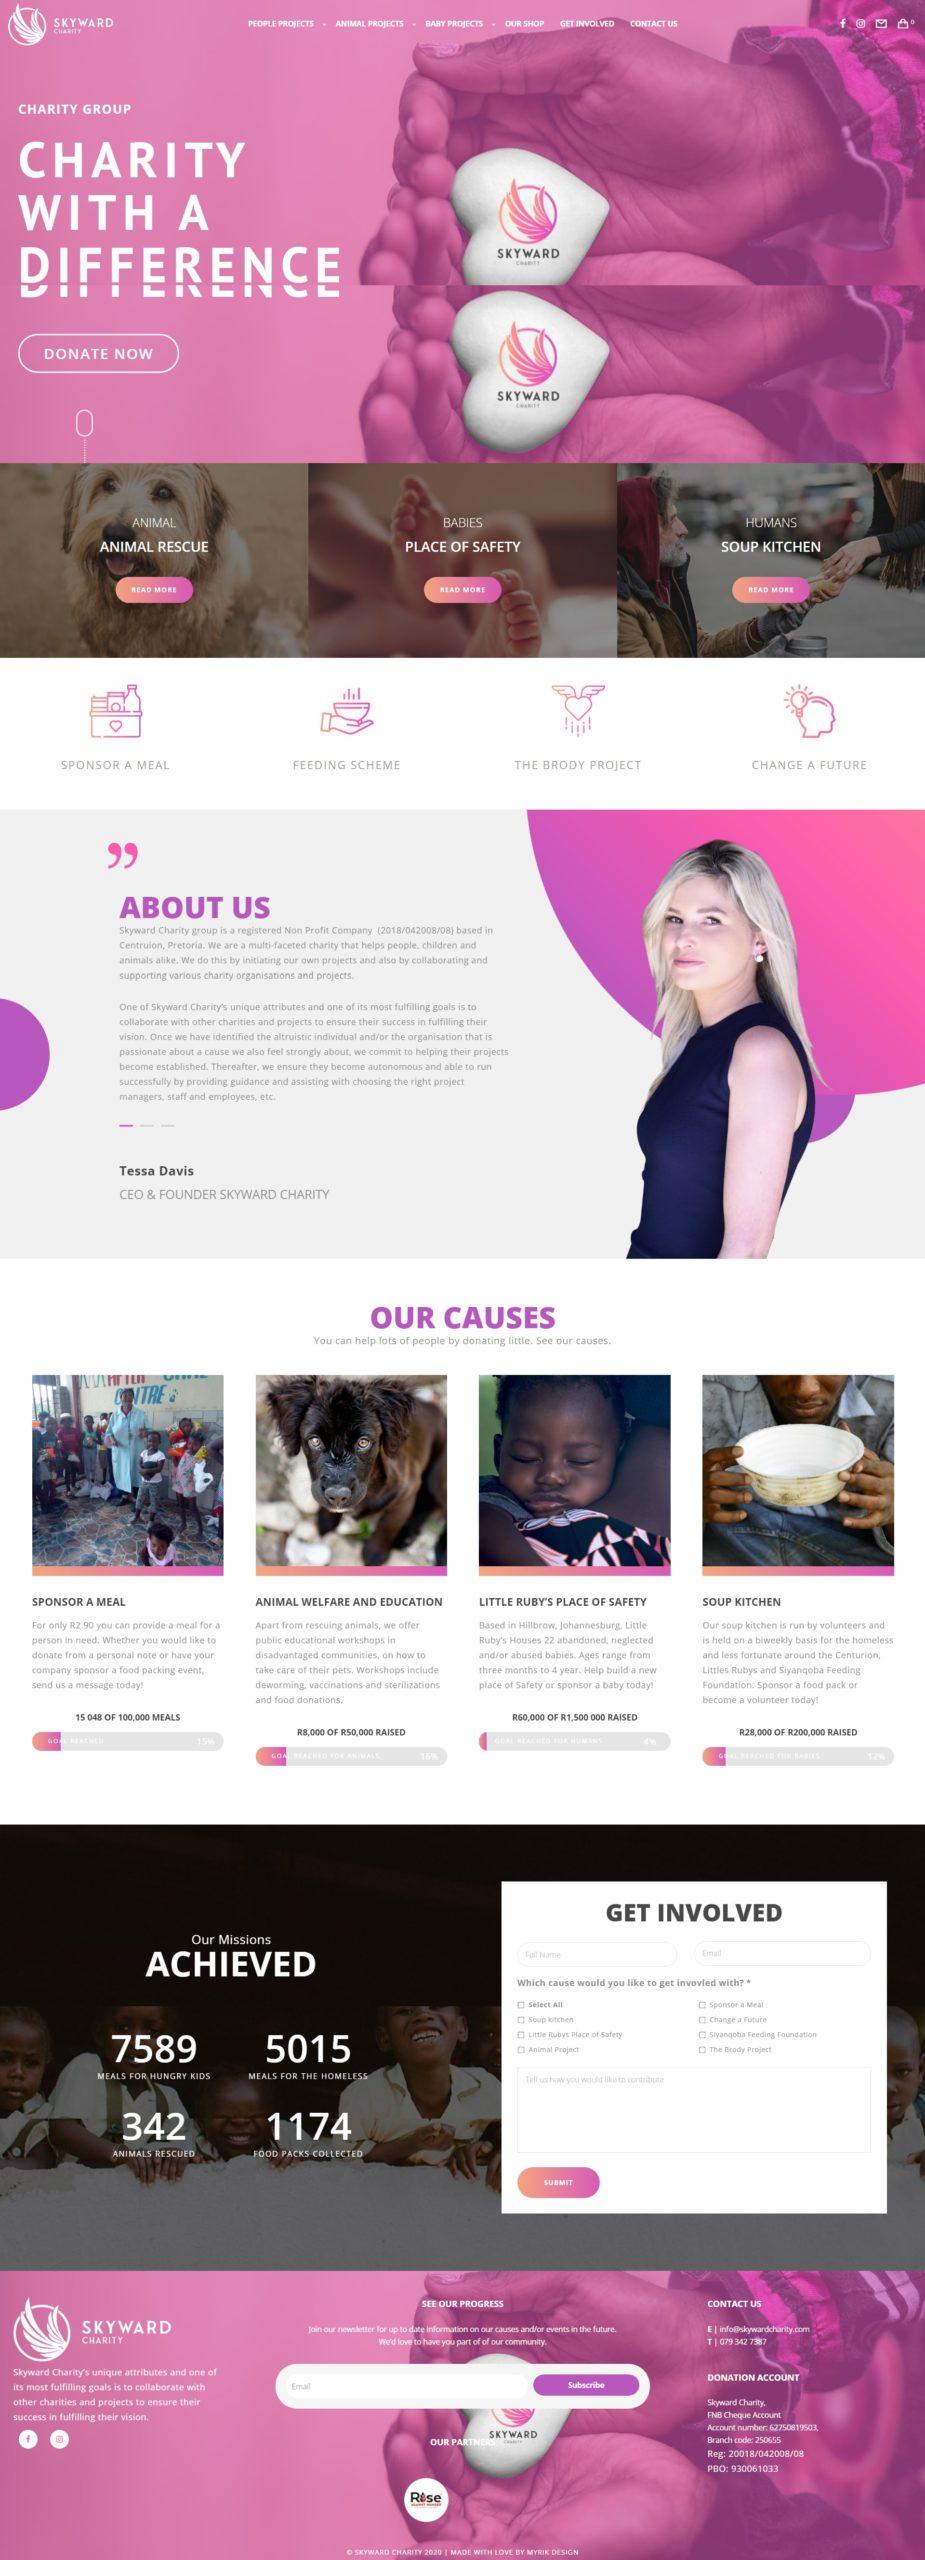 Skyward Charity Website Mockup